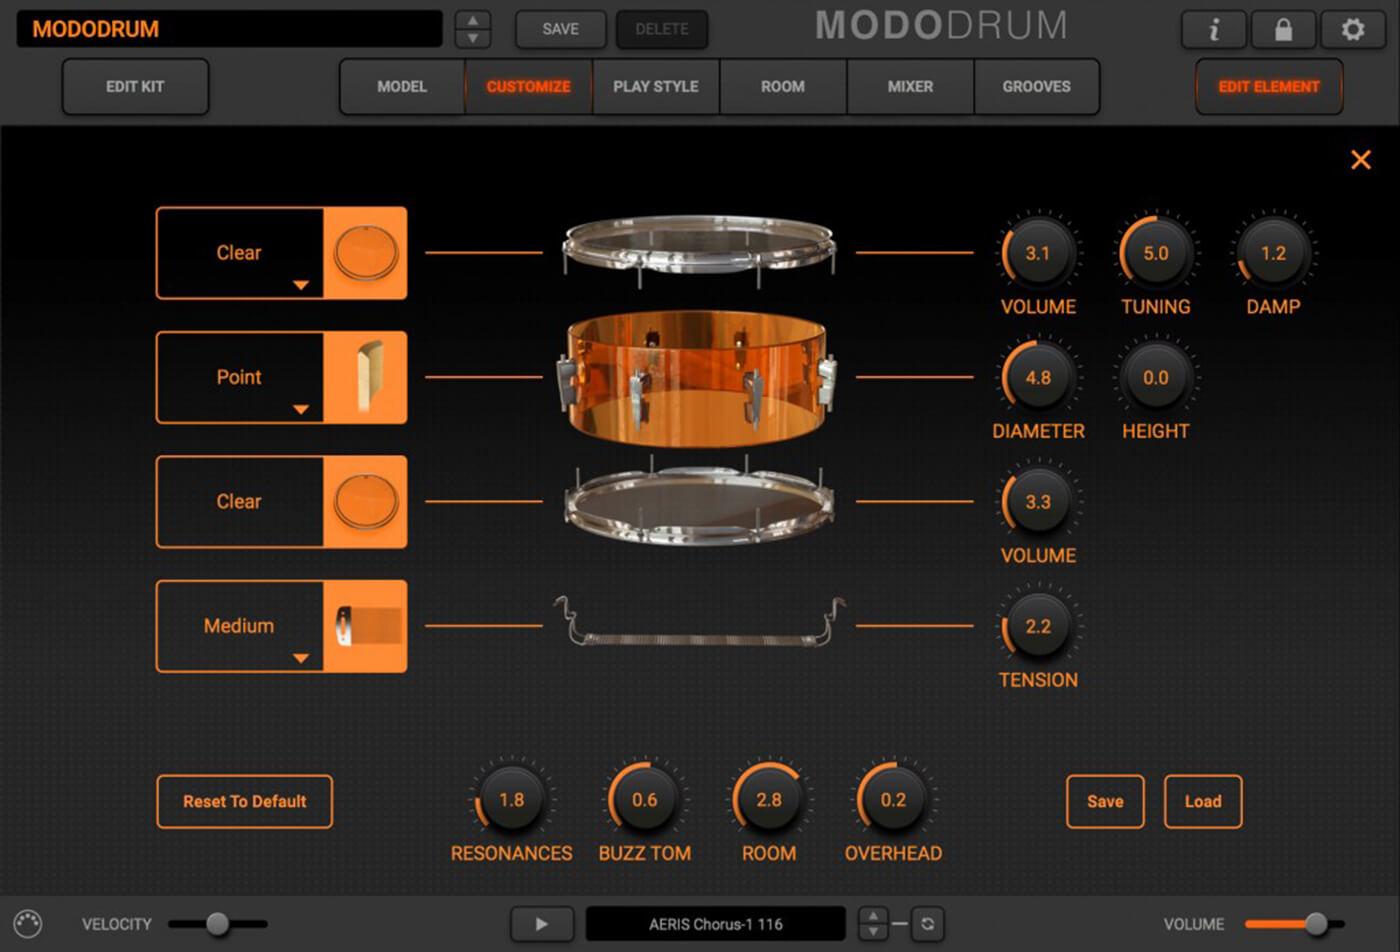 IK Multimedia Modo Drum deconstructed